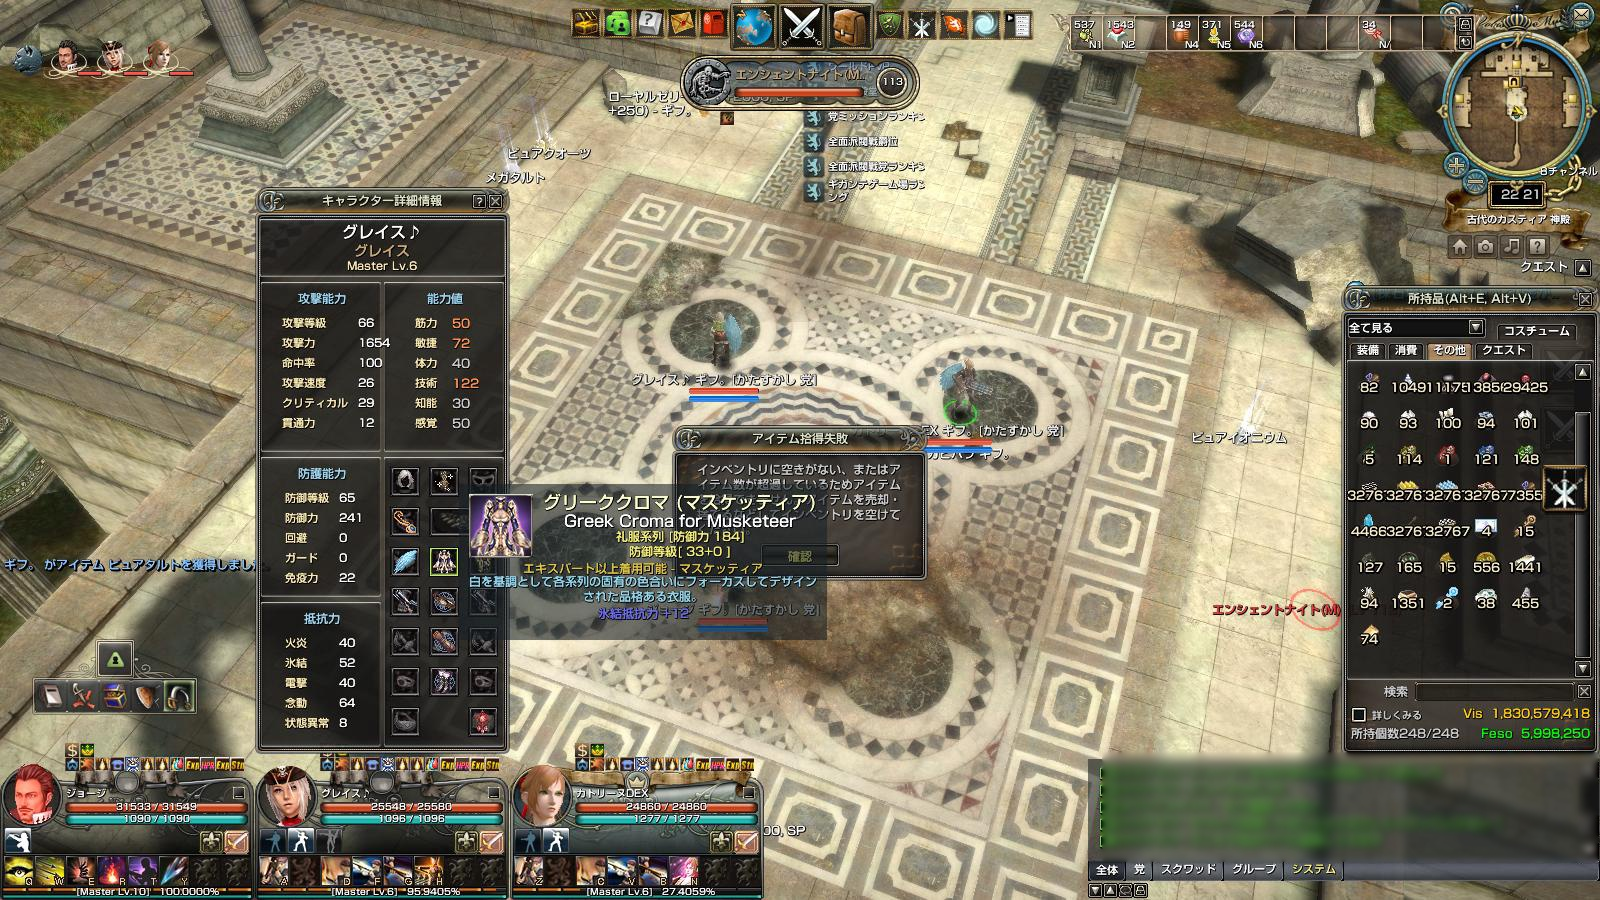 capture_20130825_222131_113.jpg